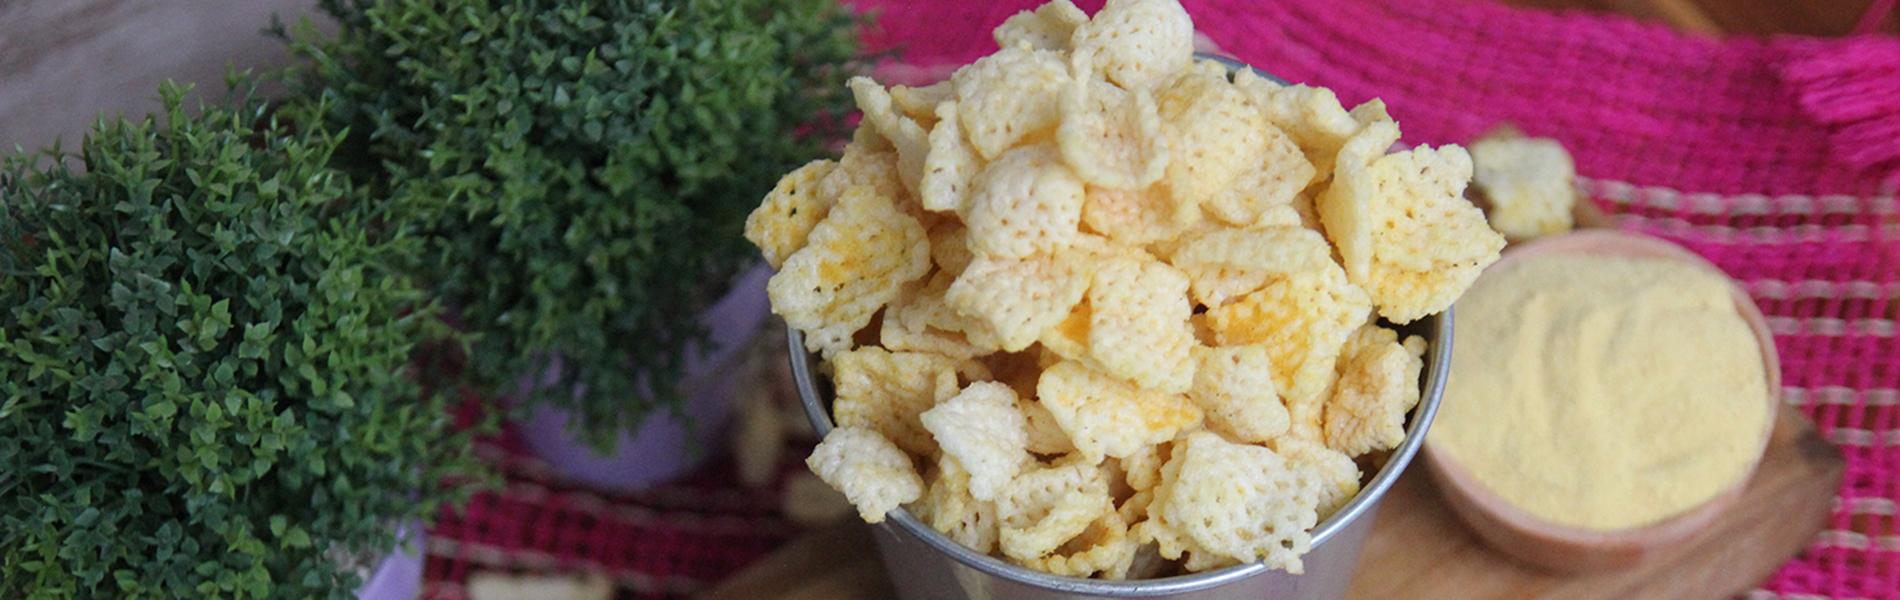 Bumbu Tabur Snack Keripik Seasoning Powder Pedas Manis 1kg Produk Terpopuler